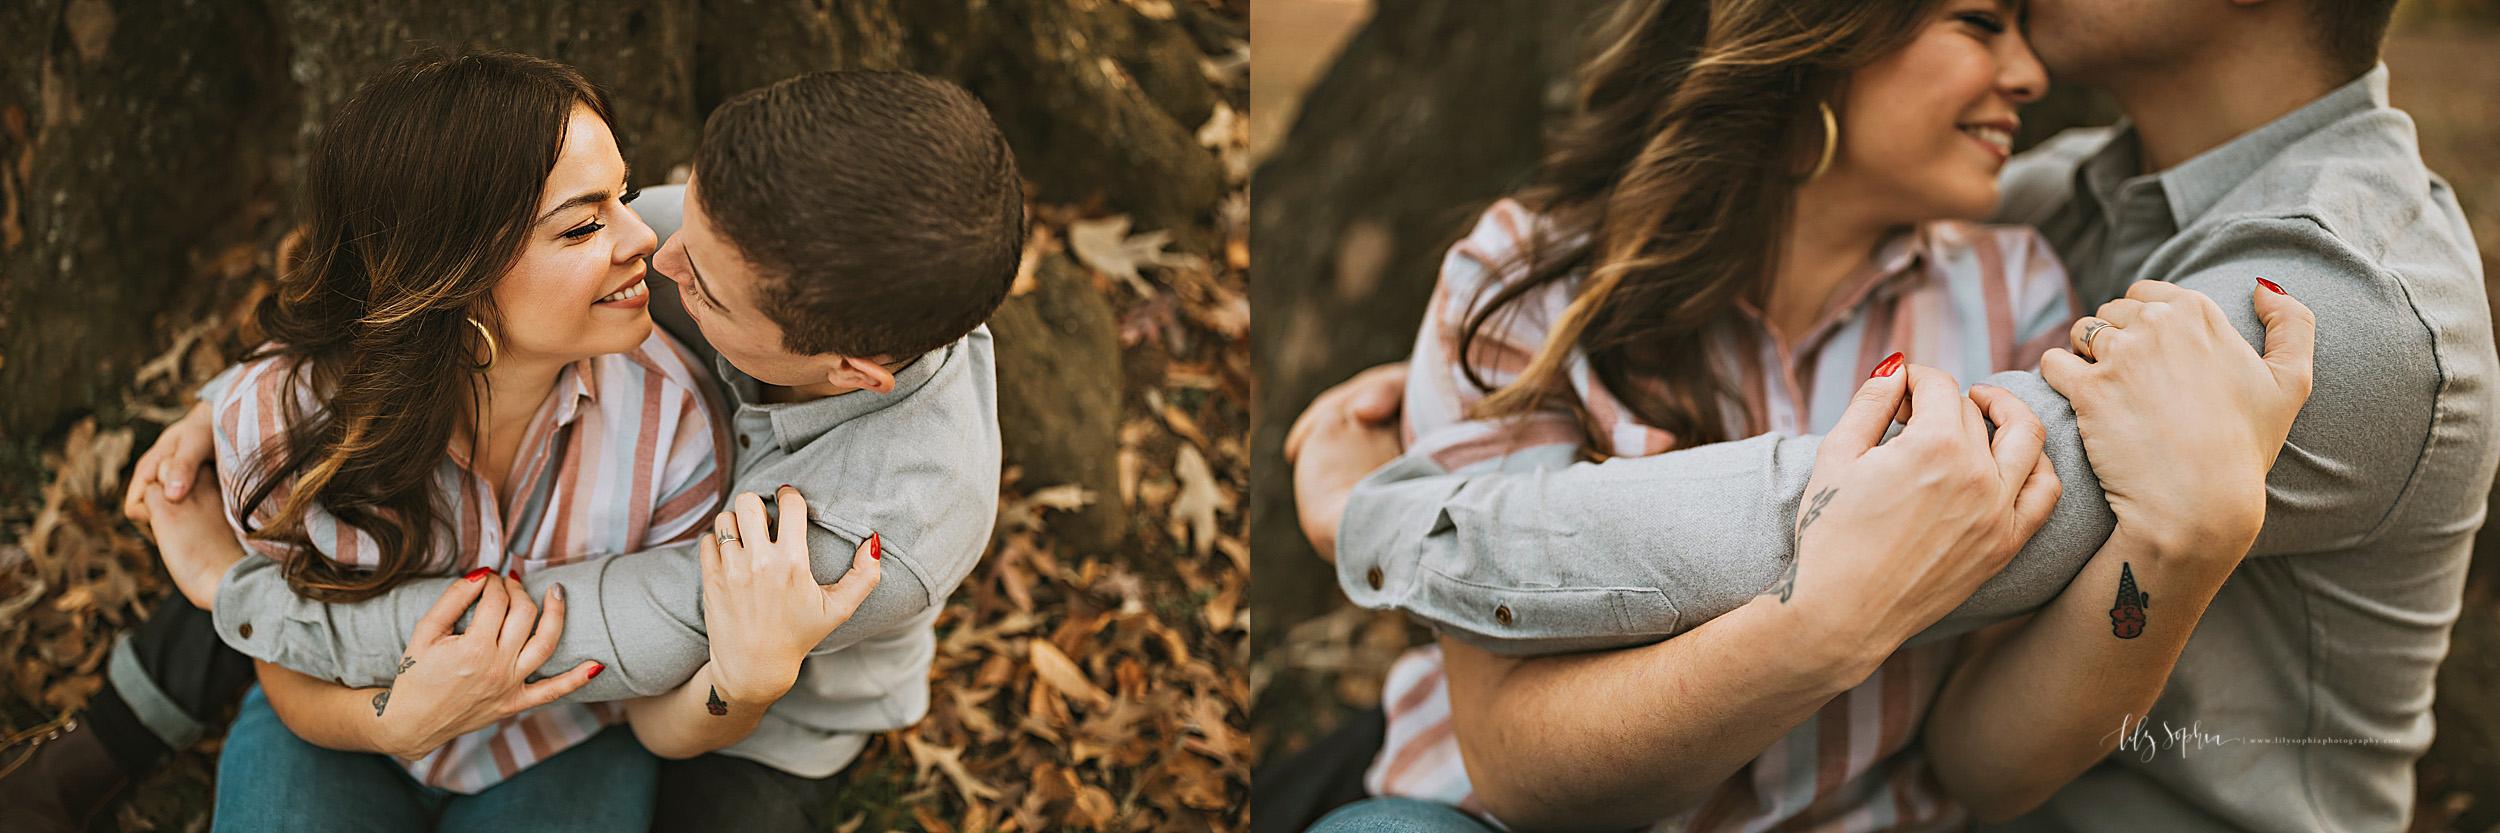 atlanta-reynoldstown-peoplestown-decatur-sandy-springs-buckhead-virginia-highlands-west-end-decatur-lily-sophia-photography-outdoor-fall-couples-photos_1473.jpg